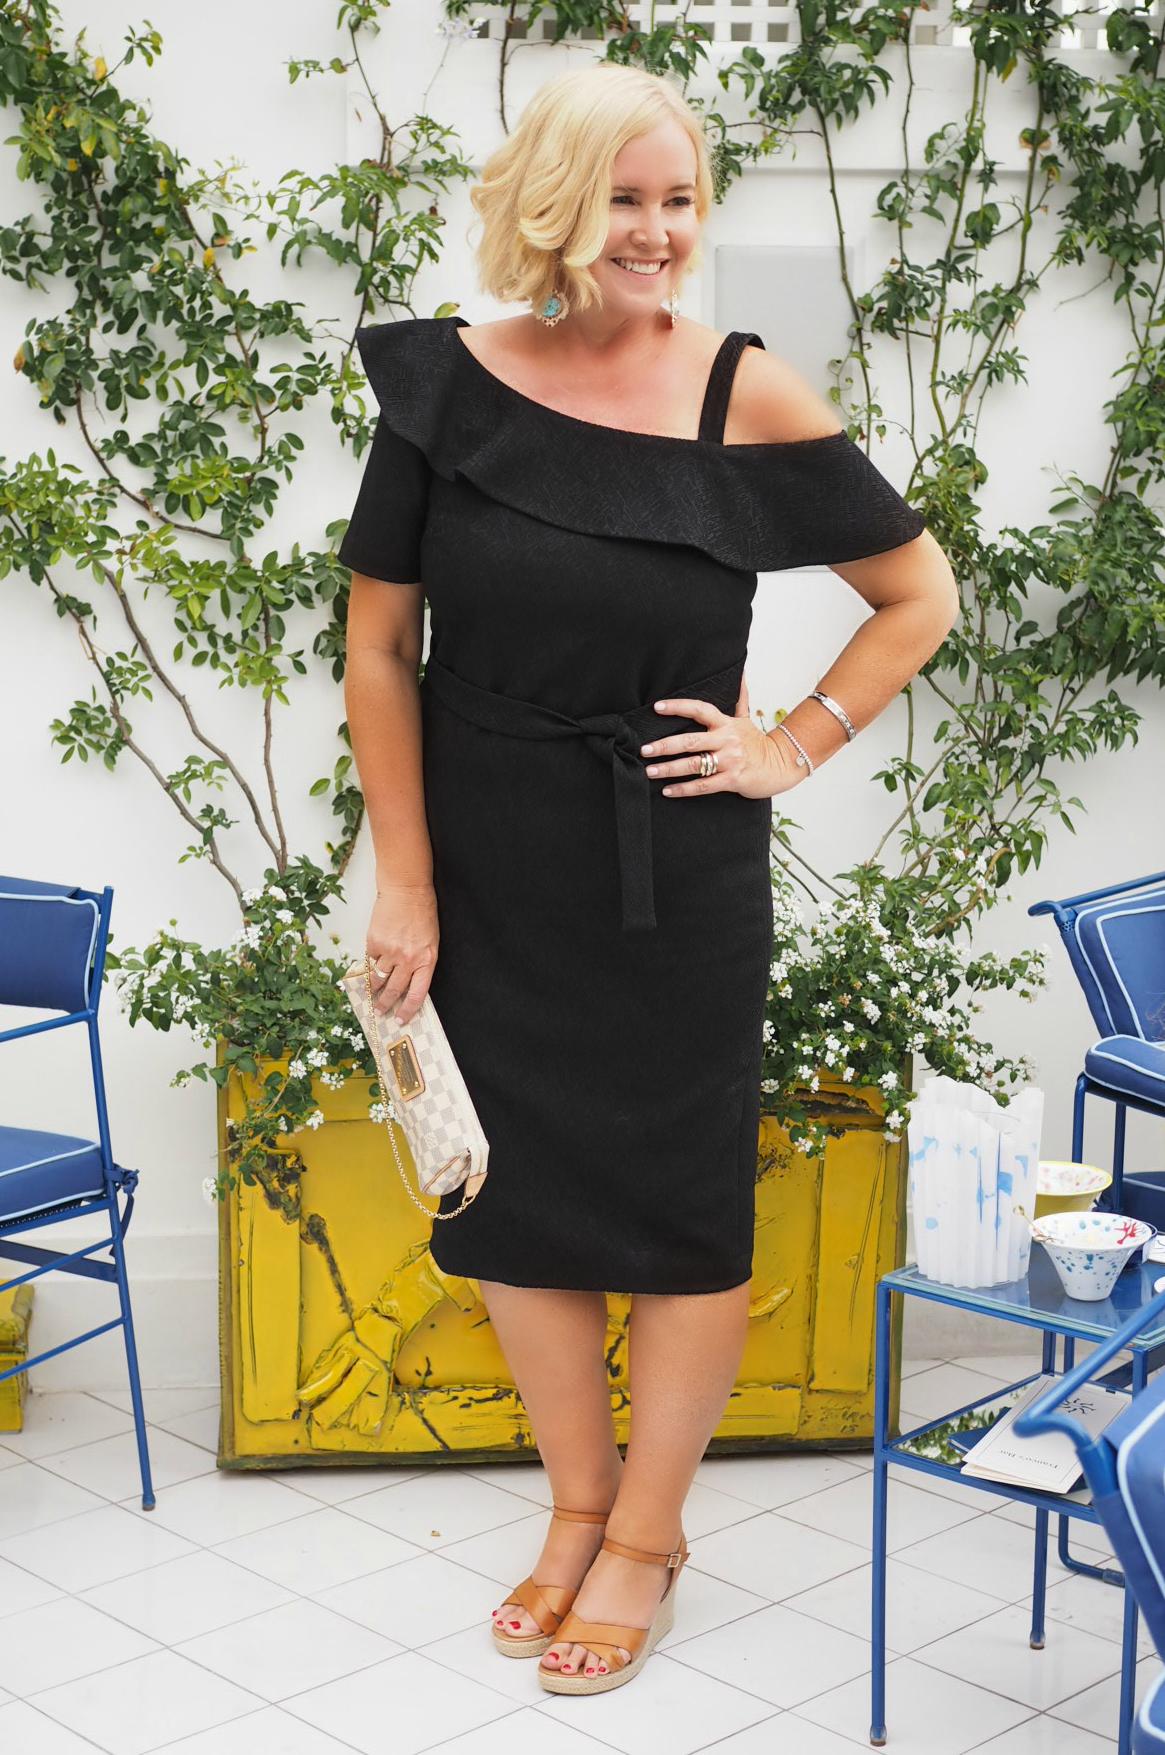 Sacha Drake dress | Christie Nicholaides earrings | FRANKiE4 Footwear wedges | The Model and Me: Sacha Drake spring-summer 2017